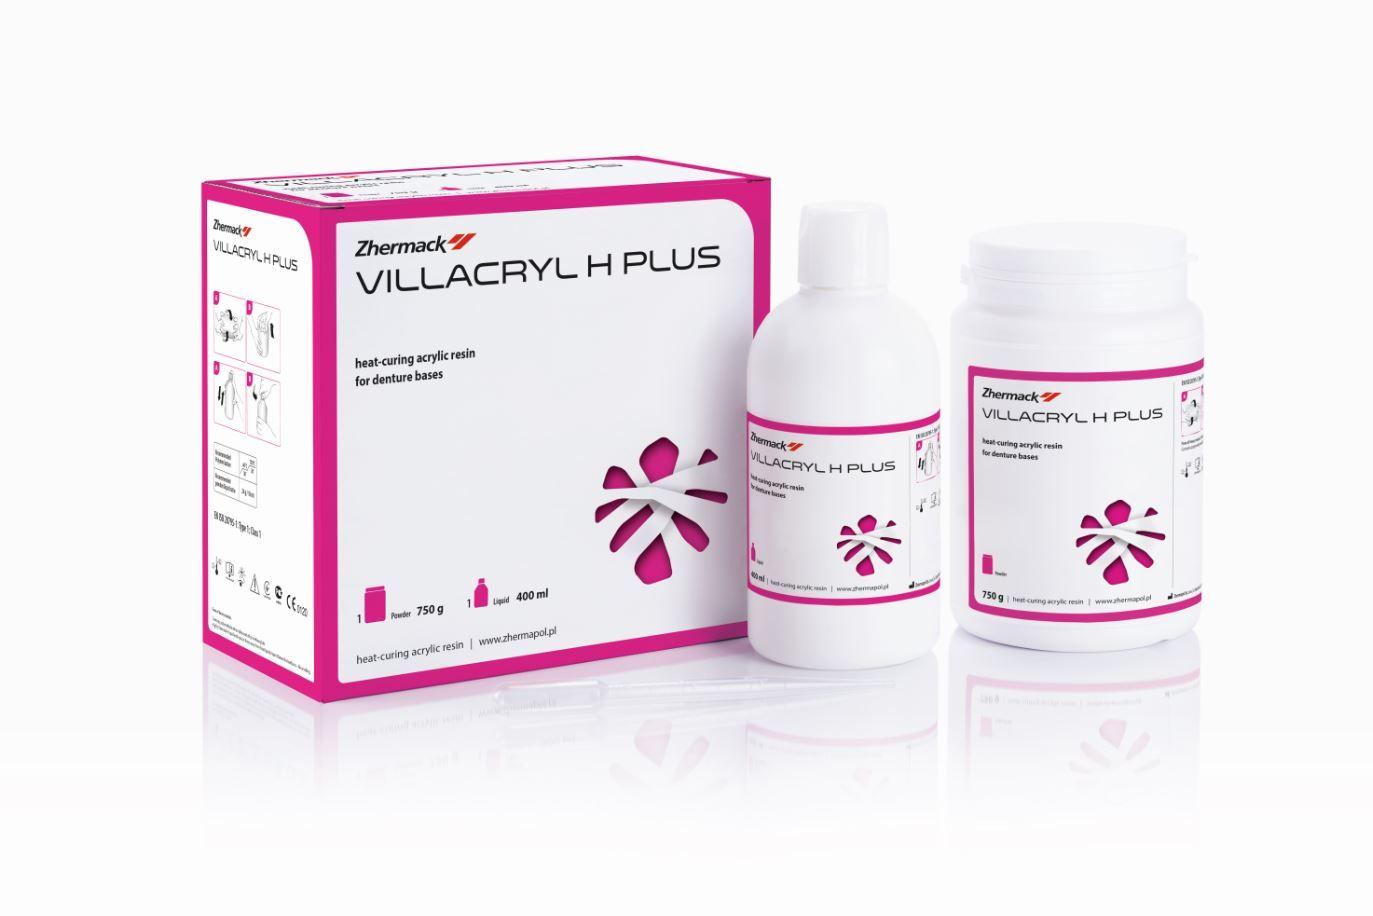 Пластмасса Villacryl H Plus цвет V4, 750г + 400мл, Zhermapol